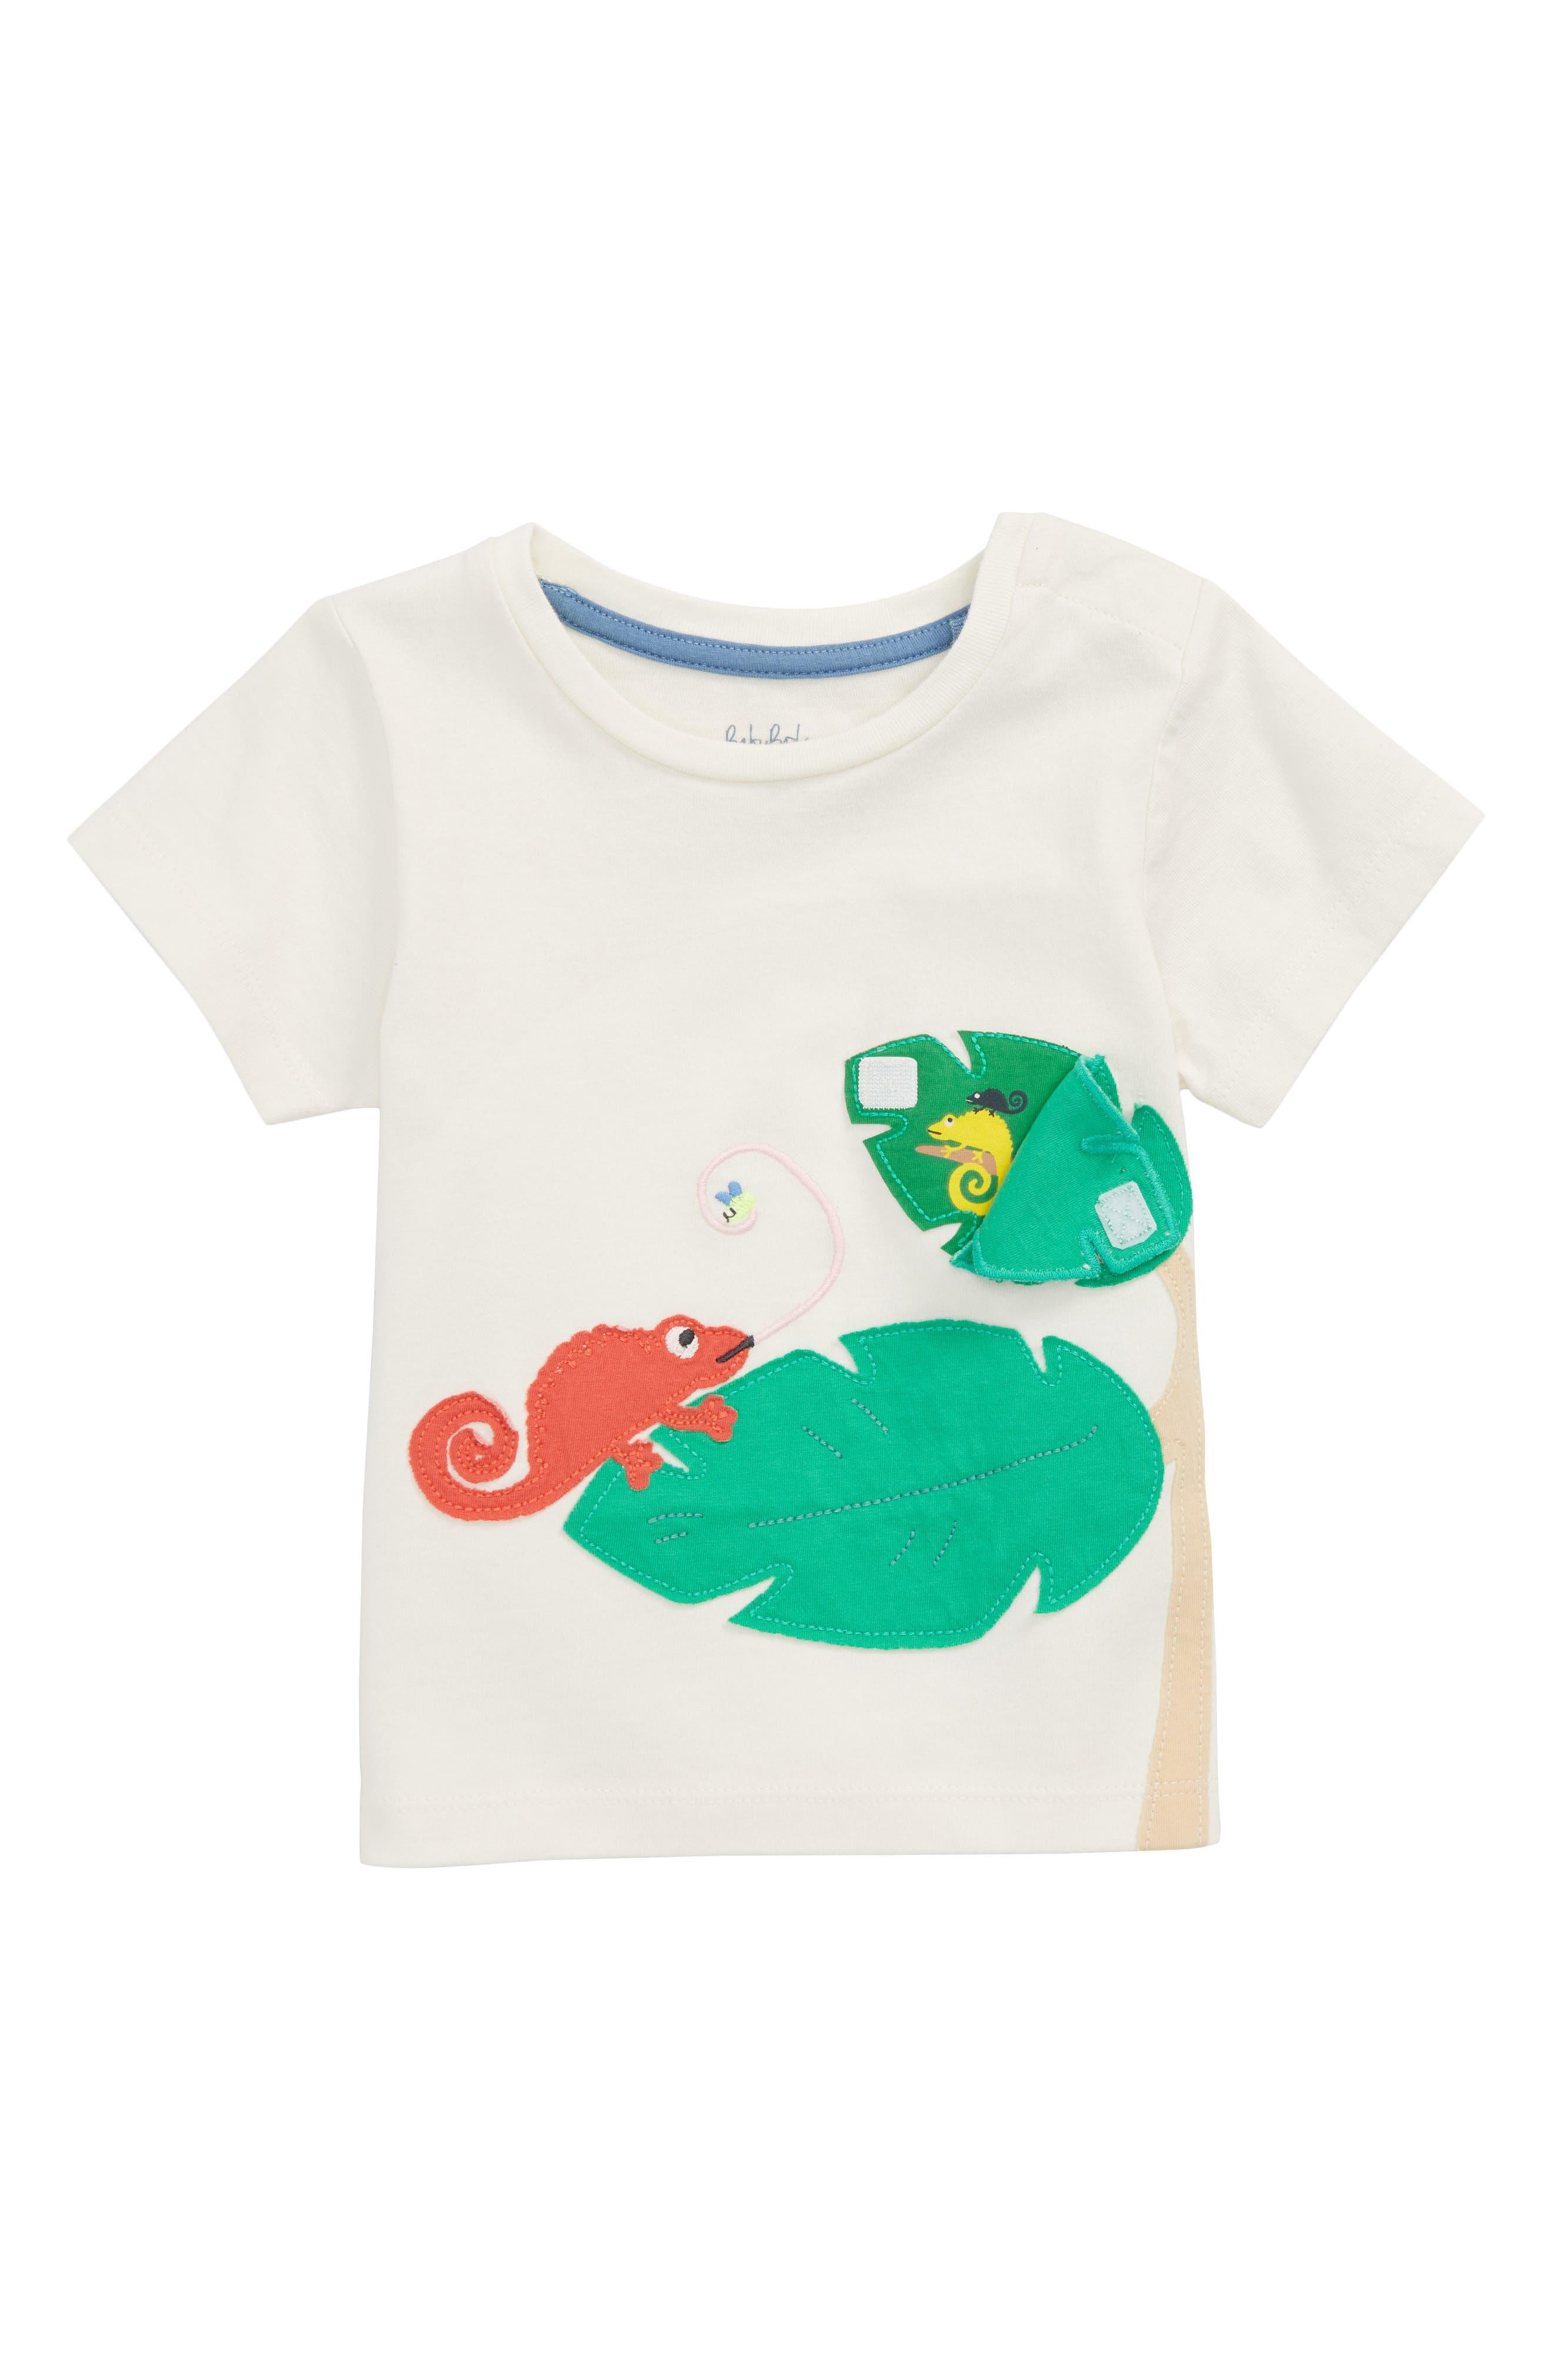 Peekaboo T-Shirt,                             Alternate thumbnail 2, color,